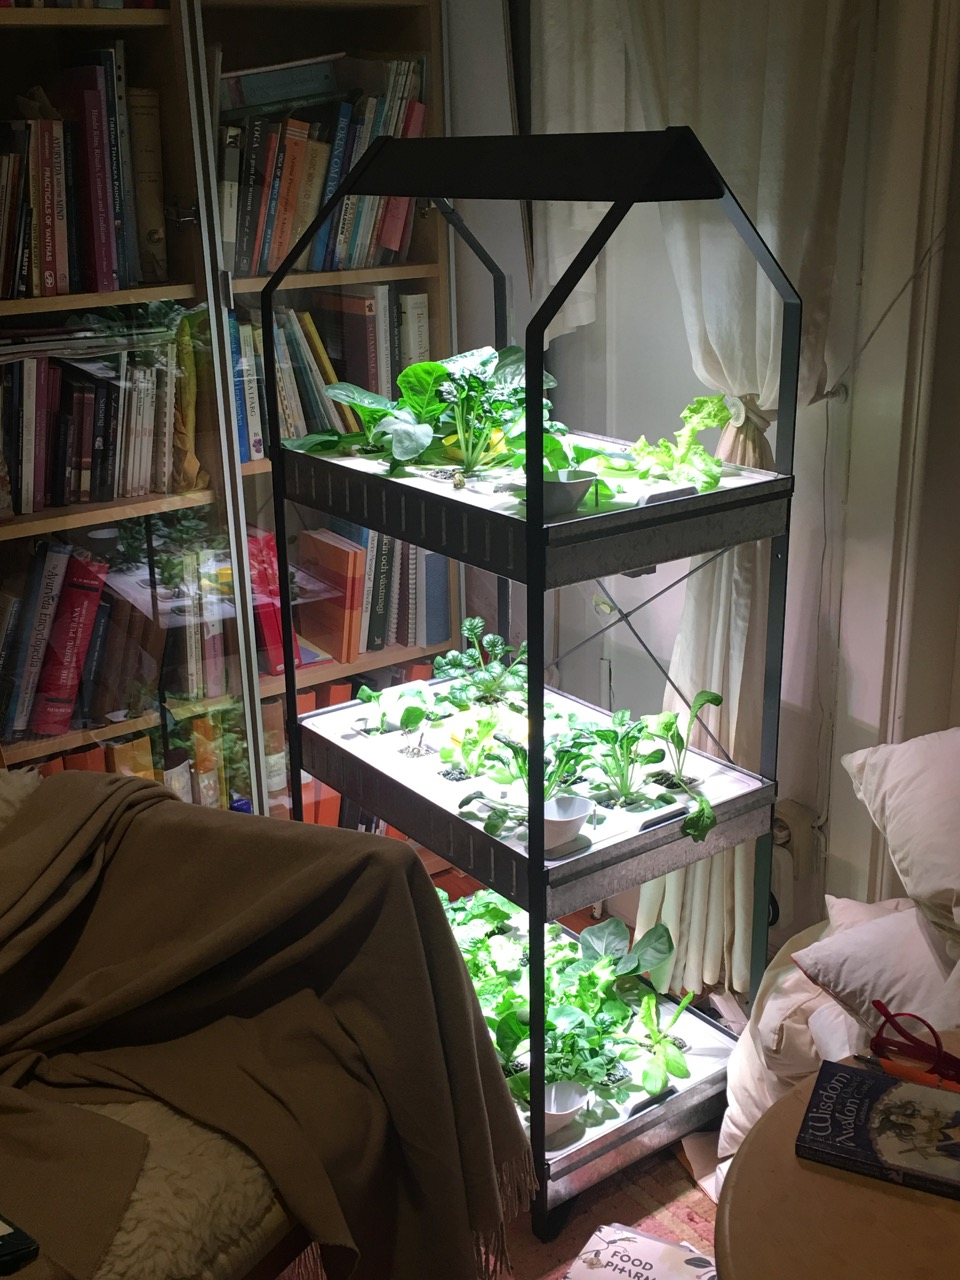 vår odling, i biblioteket